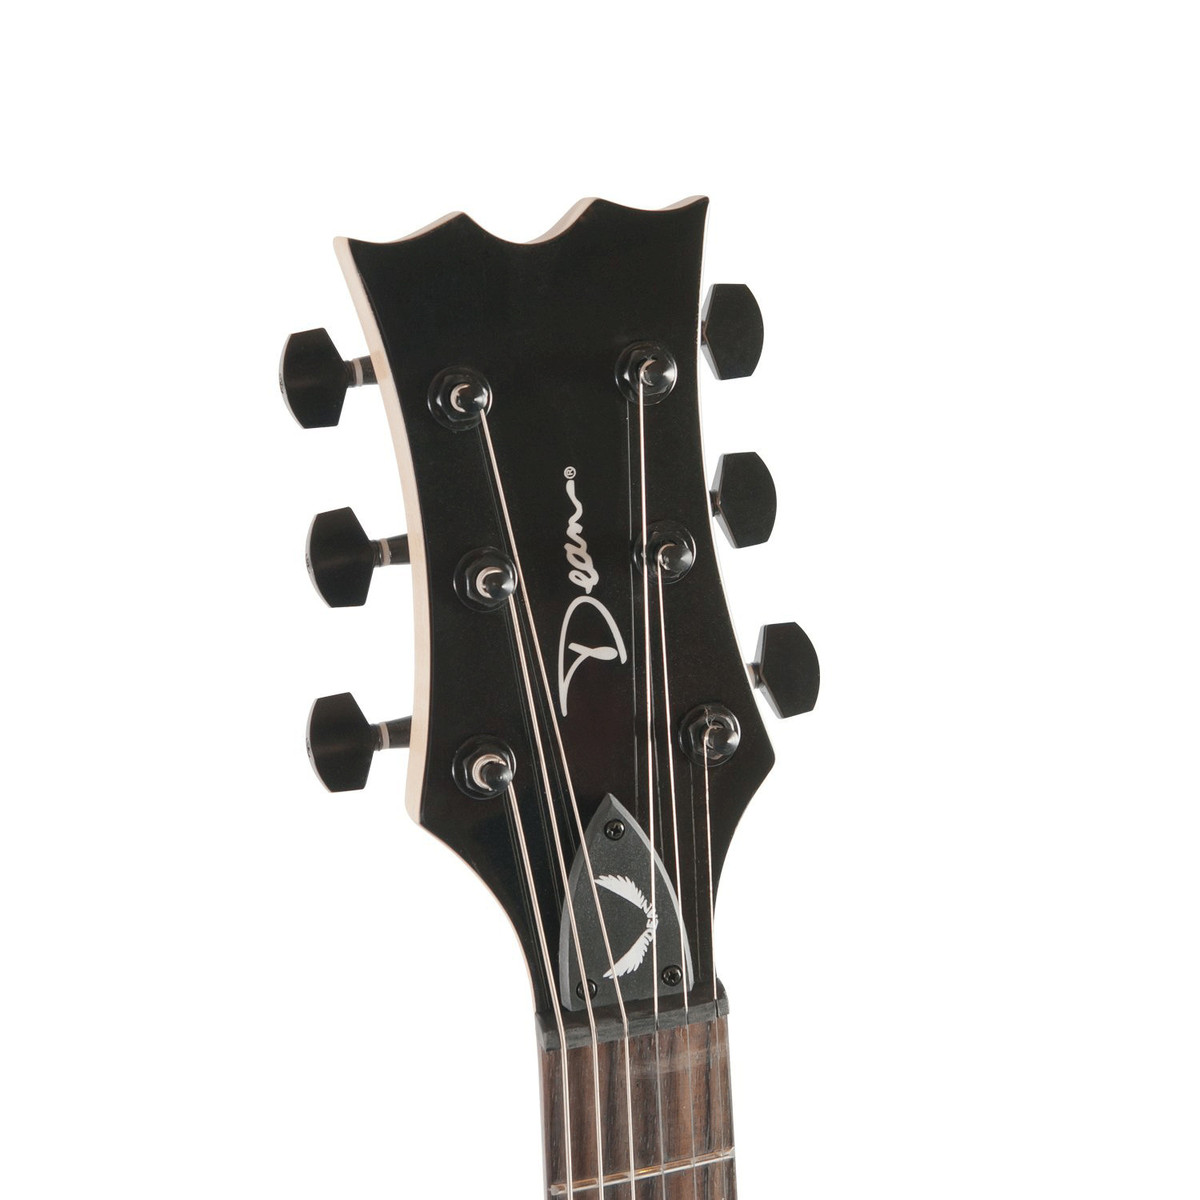 dean evo xm electric guitar metallic silver at gear4music. Black Bedroom Furniture Sets. Home Design Ideas